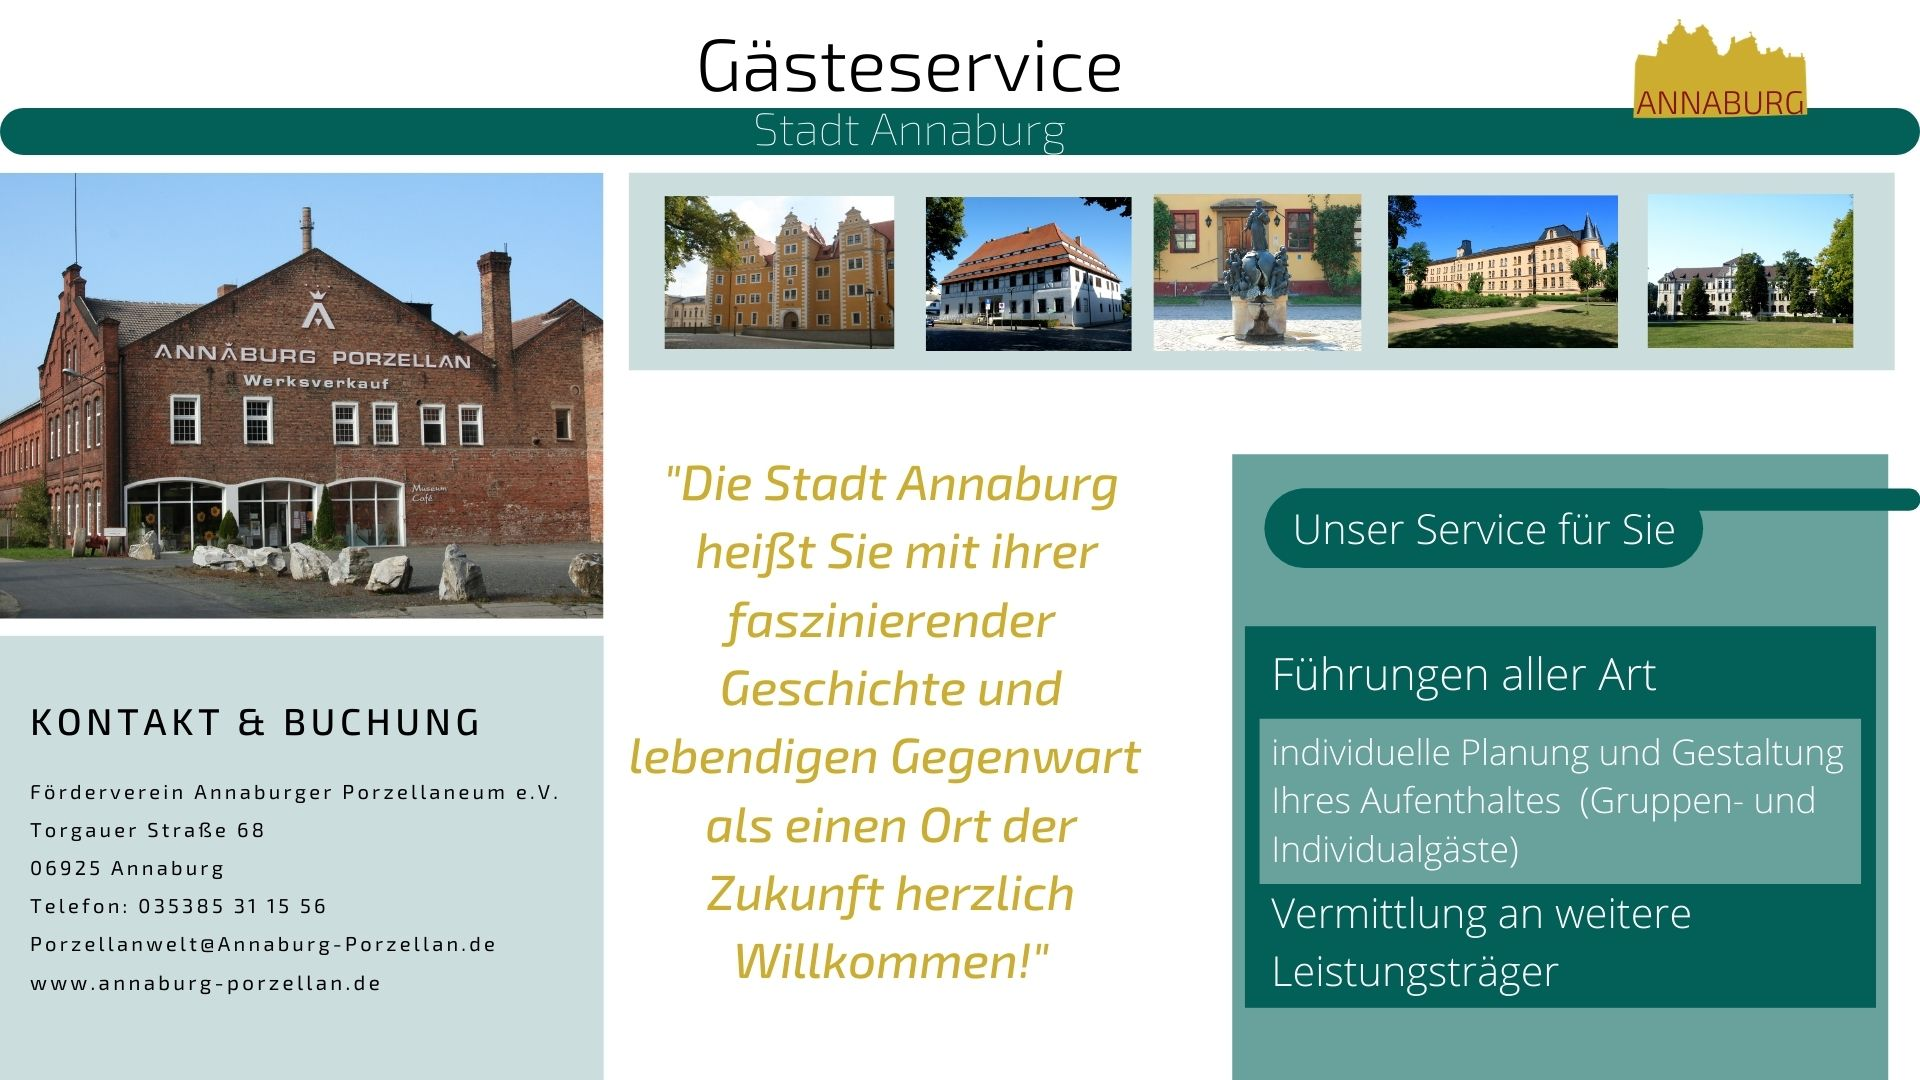 Angaben zum Gästeservice